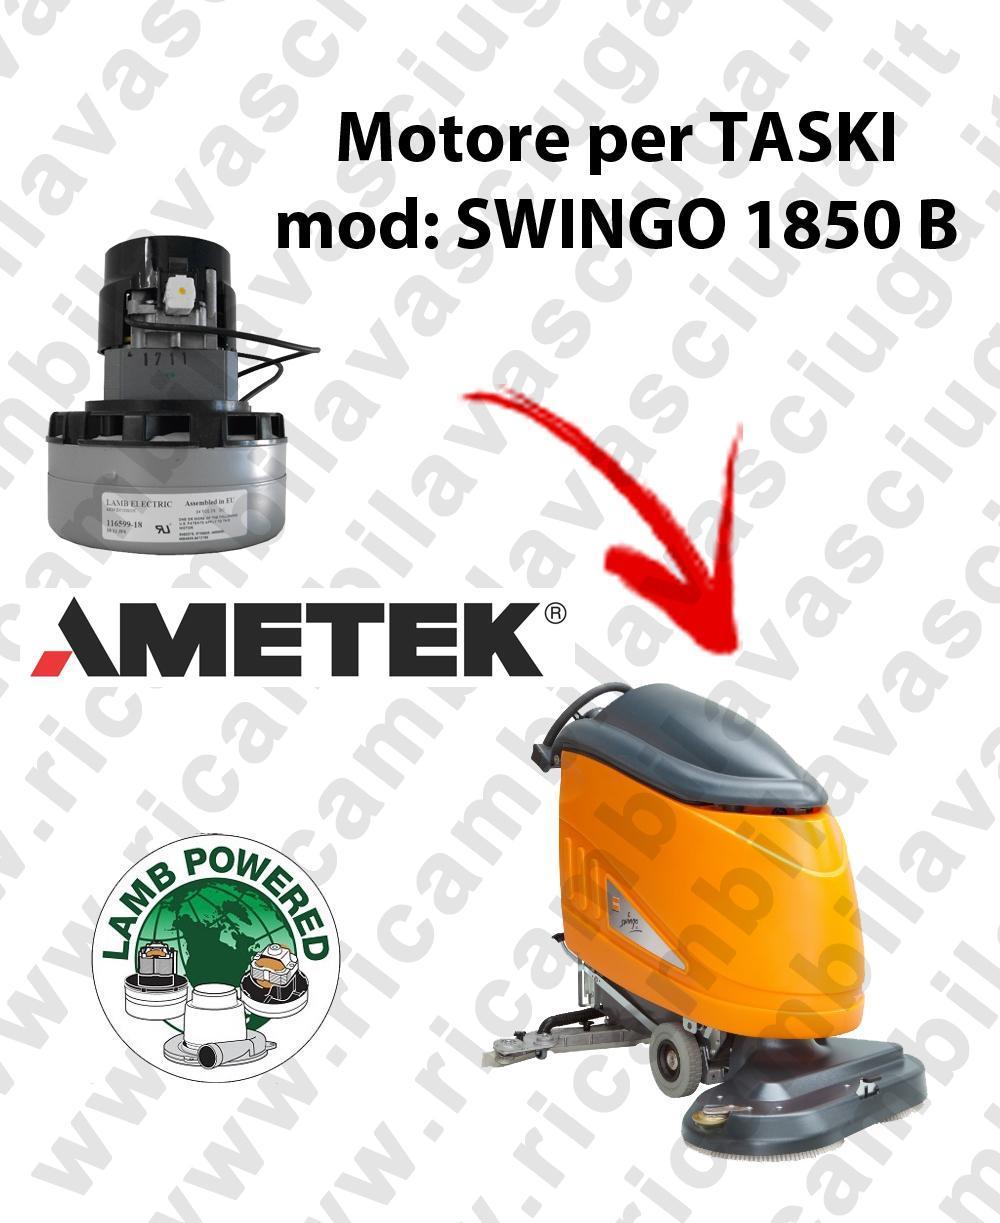 SWINGO 1850 B Motore de aspiración LAMB AMETEK para fregadora TASKI